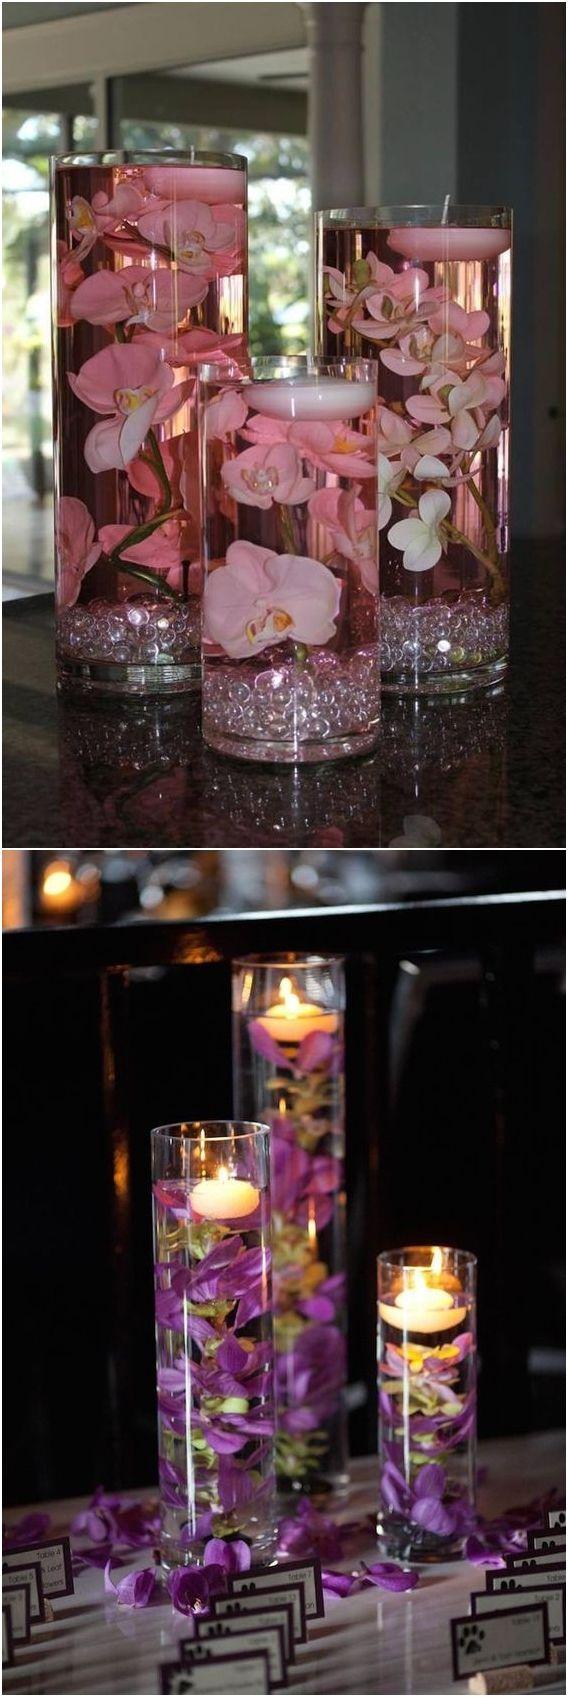 Romantic floating wedding centerpiece ideas #wedding #weddingideas #centerpiece / http://www.deerpearlflowers.com/floating-wedding-centerpieces/